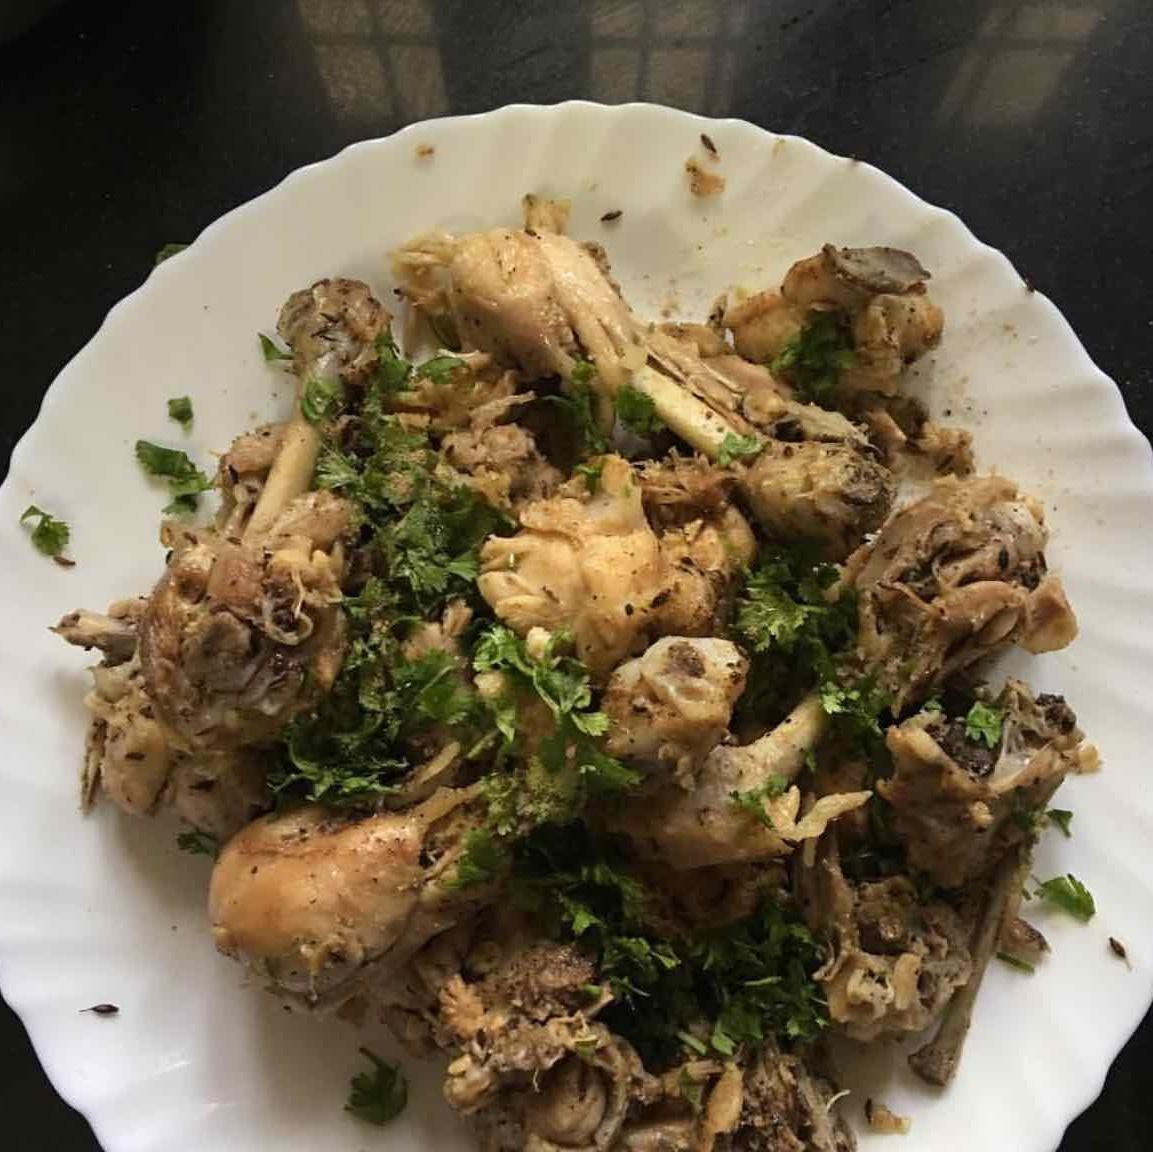 Photo of chicken Kali mirch by Rakhi Lakhan at BetterButter